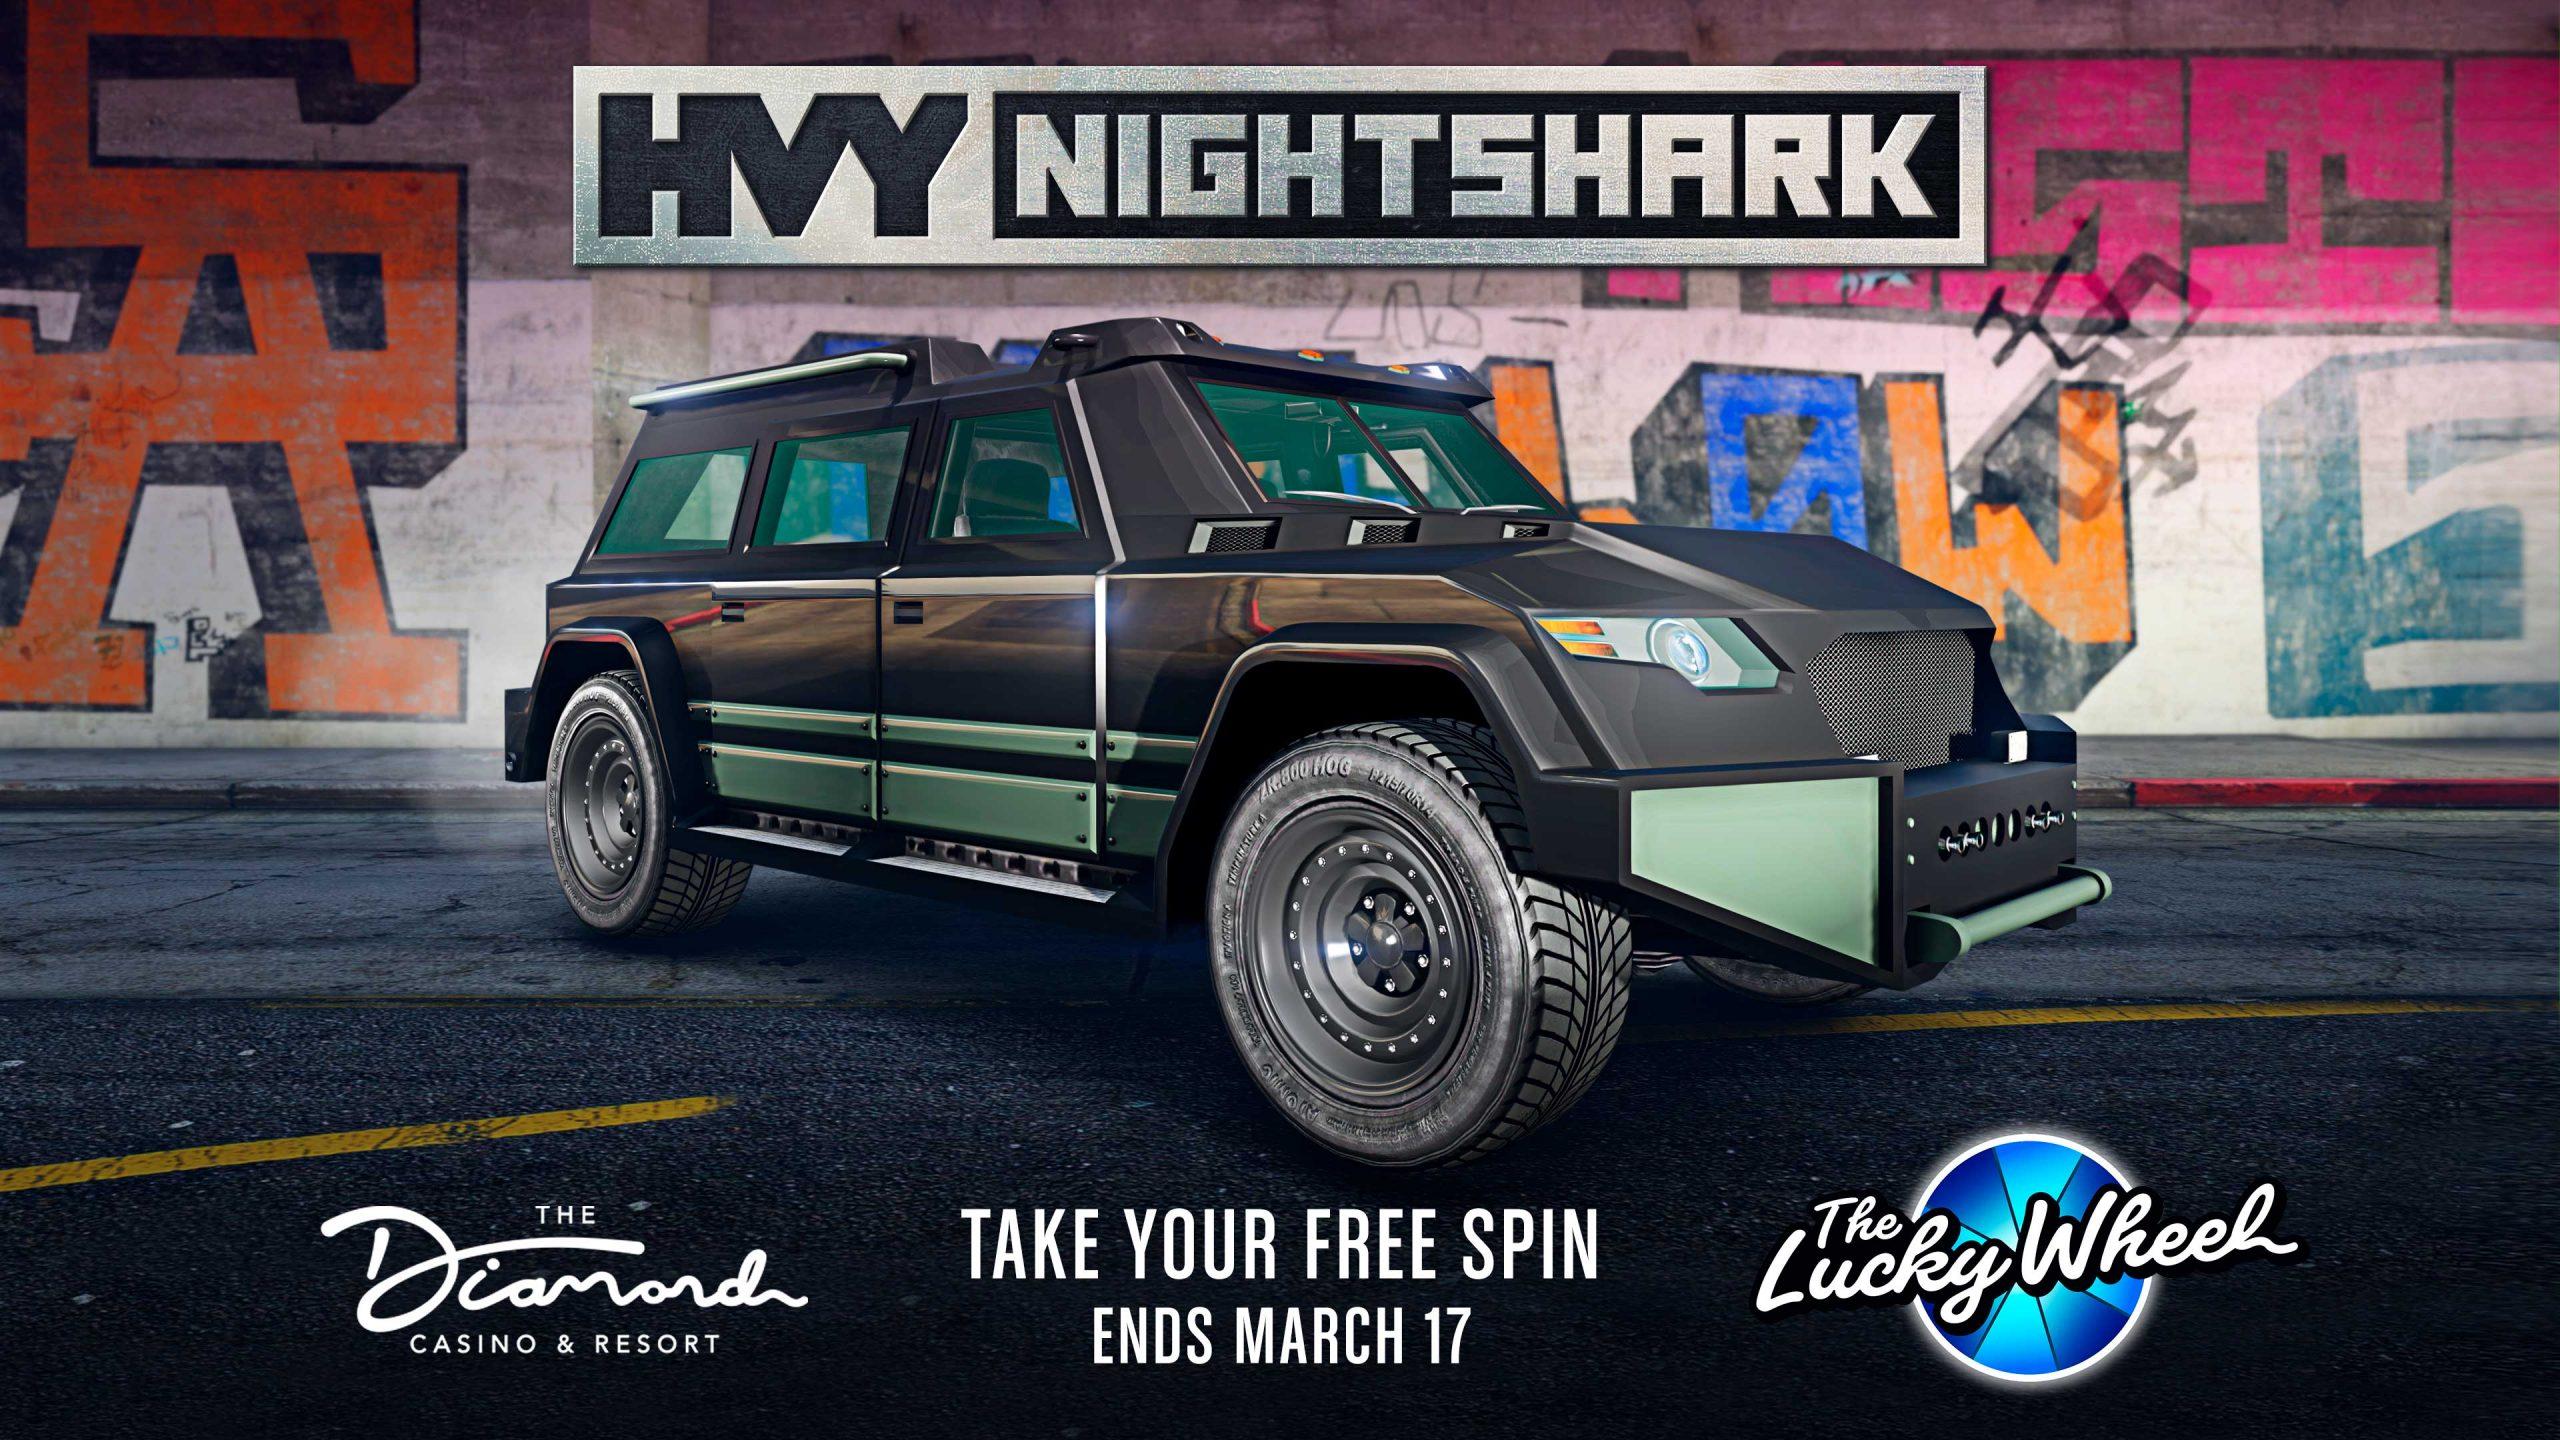 Diamond Casino & Resort HYV NightShark